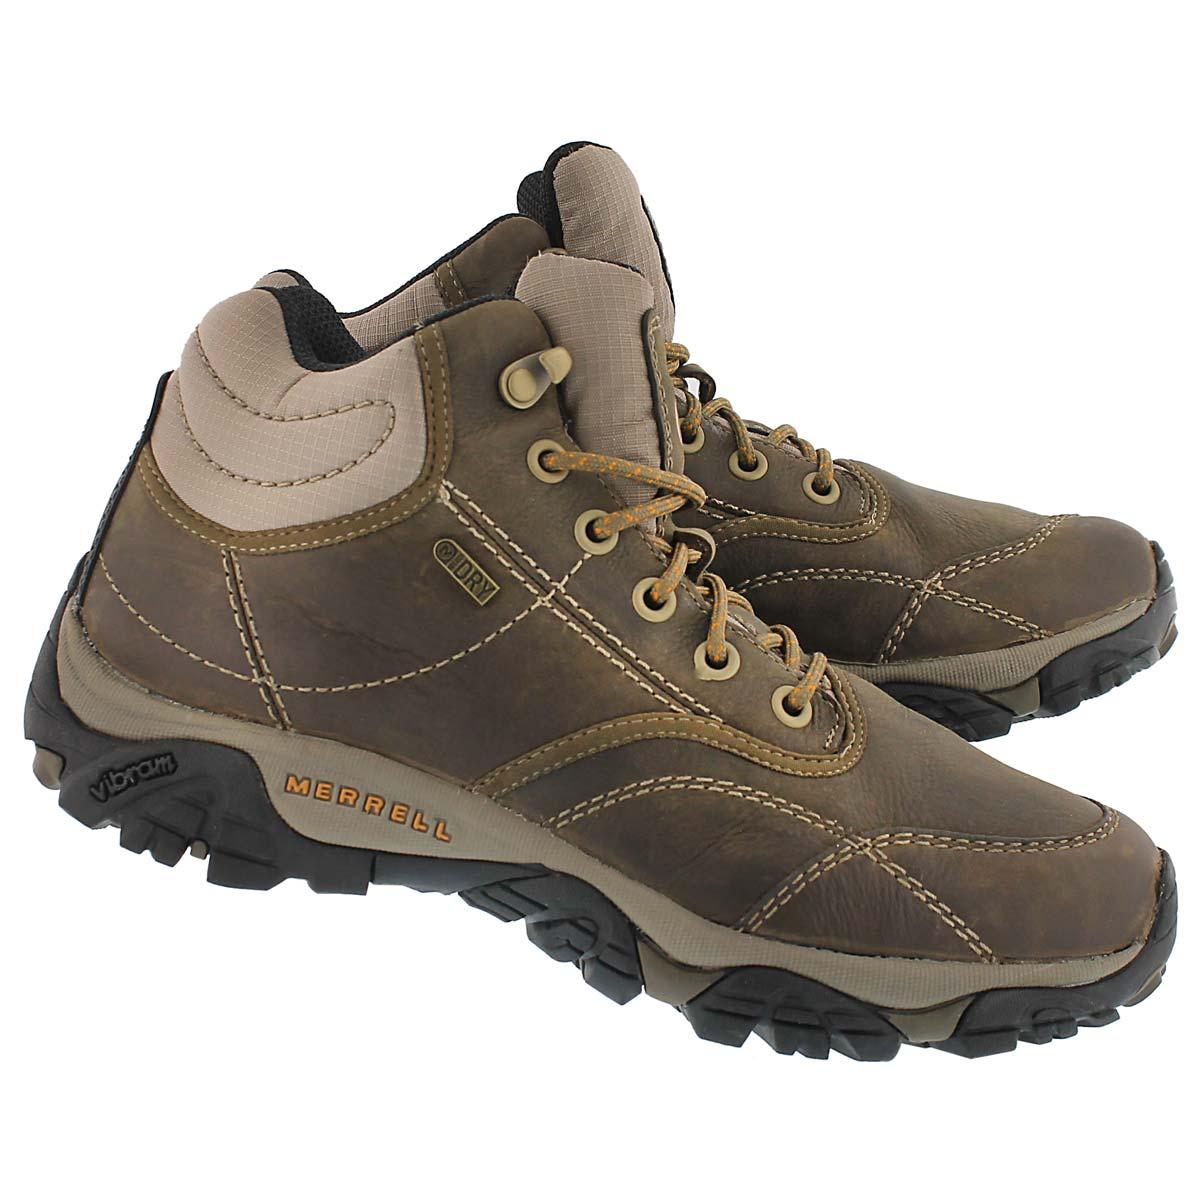 Mns Moab Rover Mid brn wtpf hiking shoe